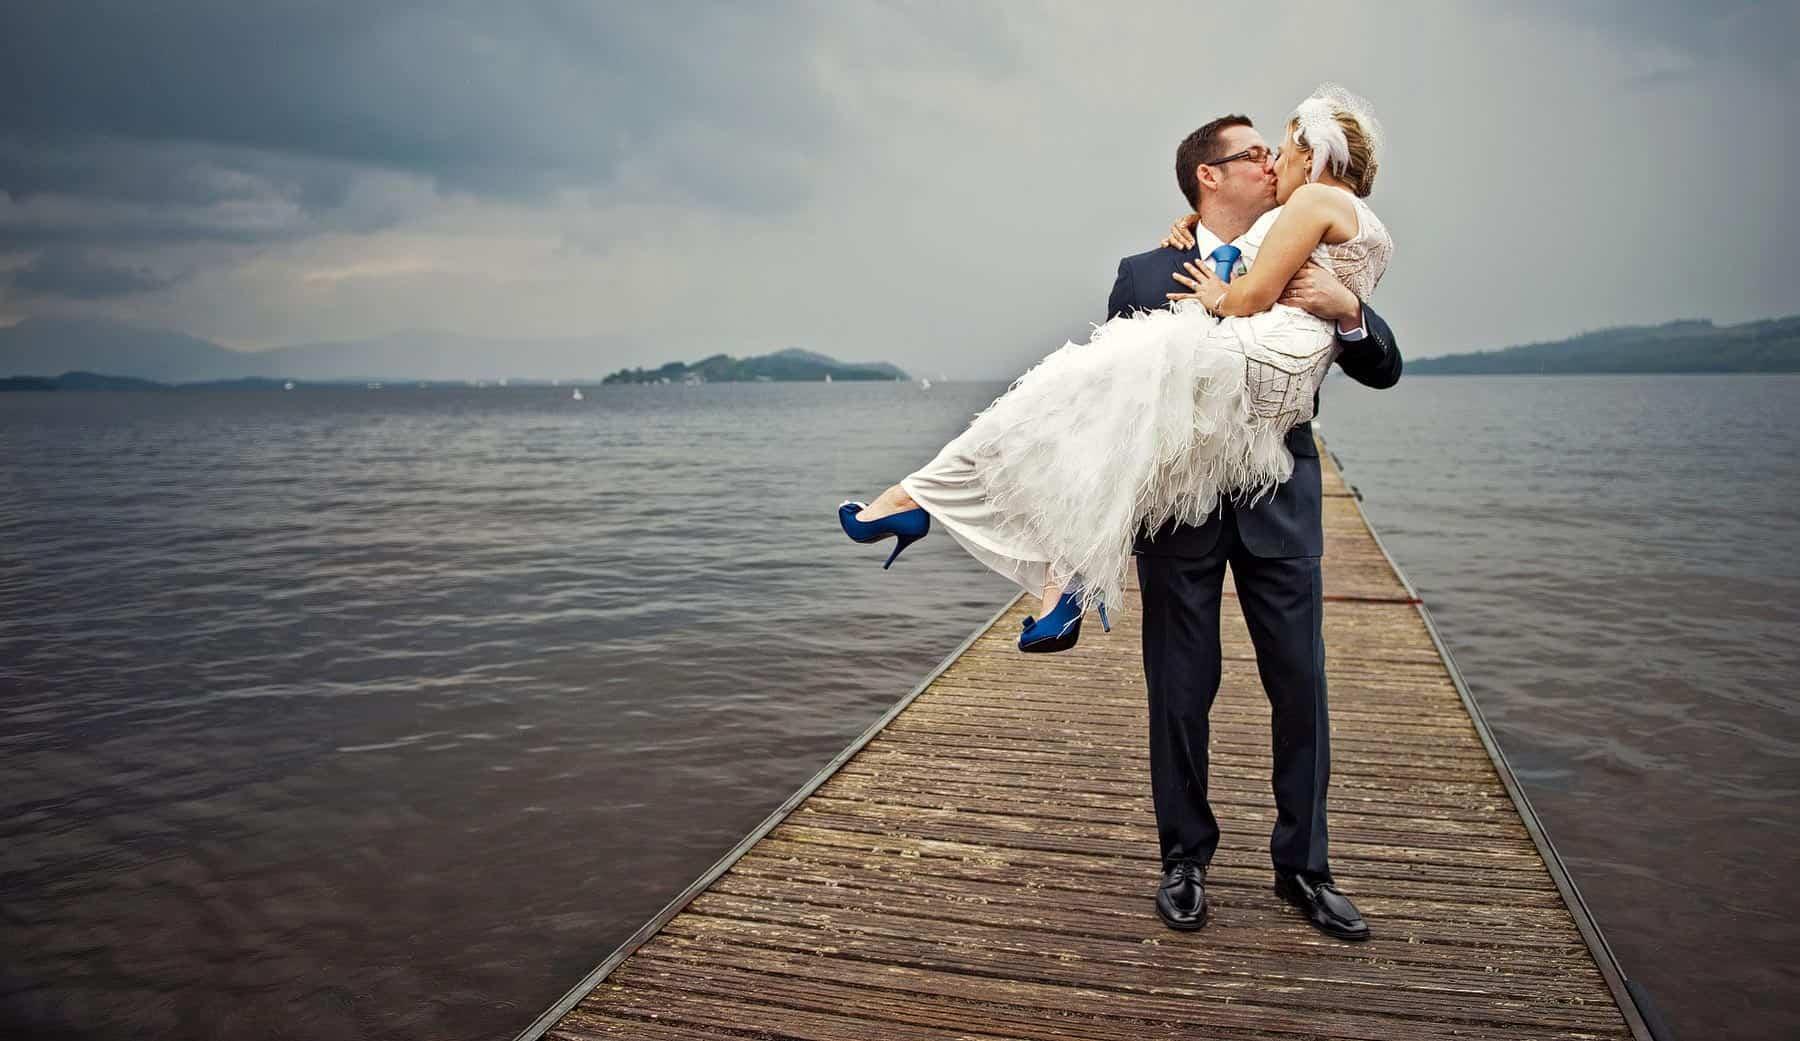 Creative Wedding Photographer in Glasgow - BK Wedding Photography